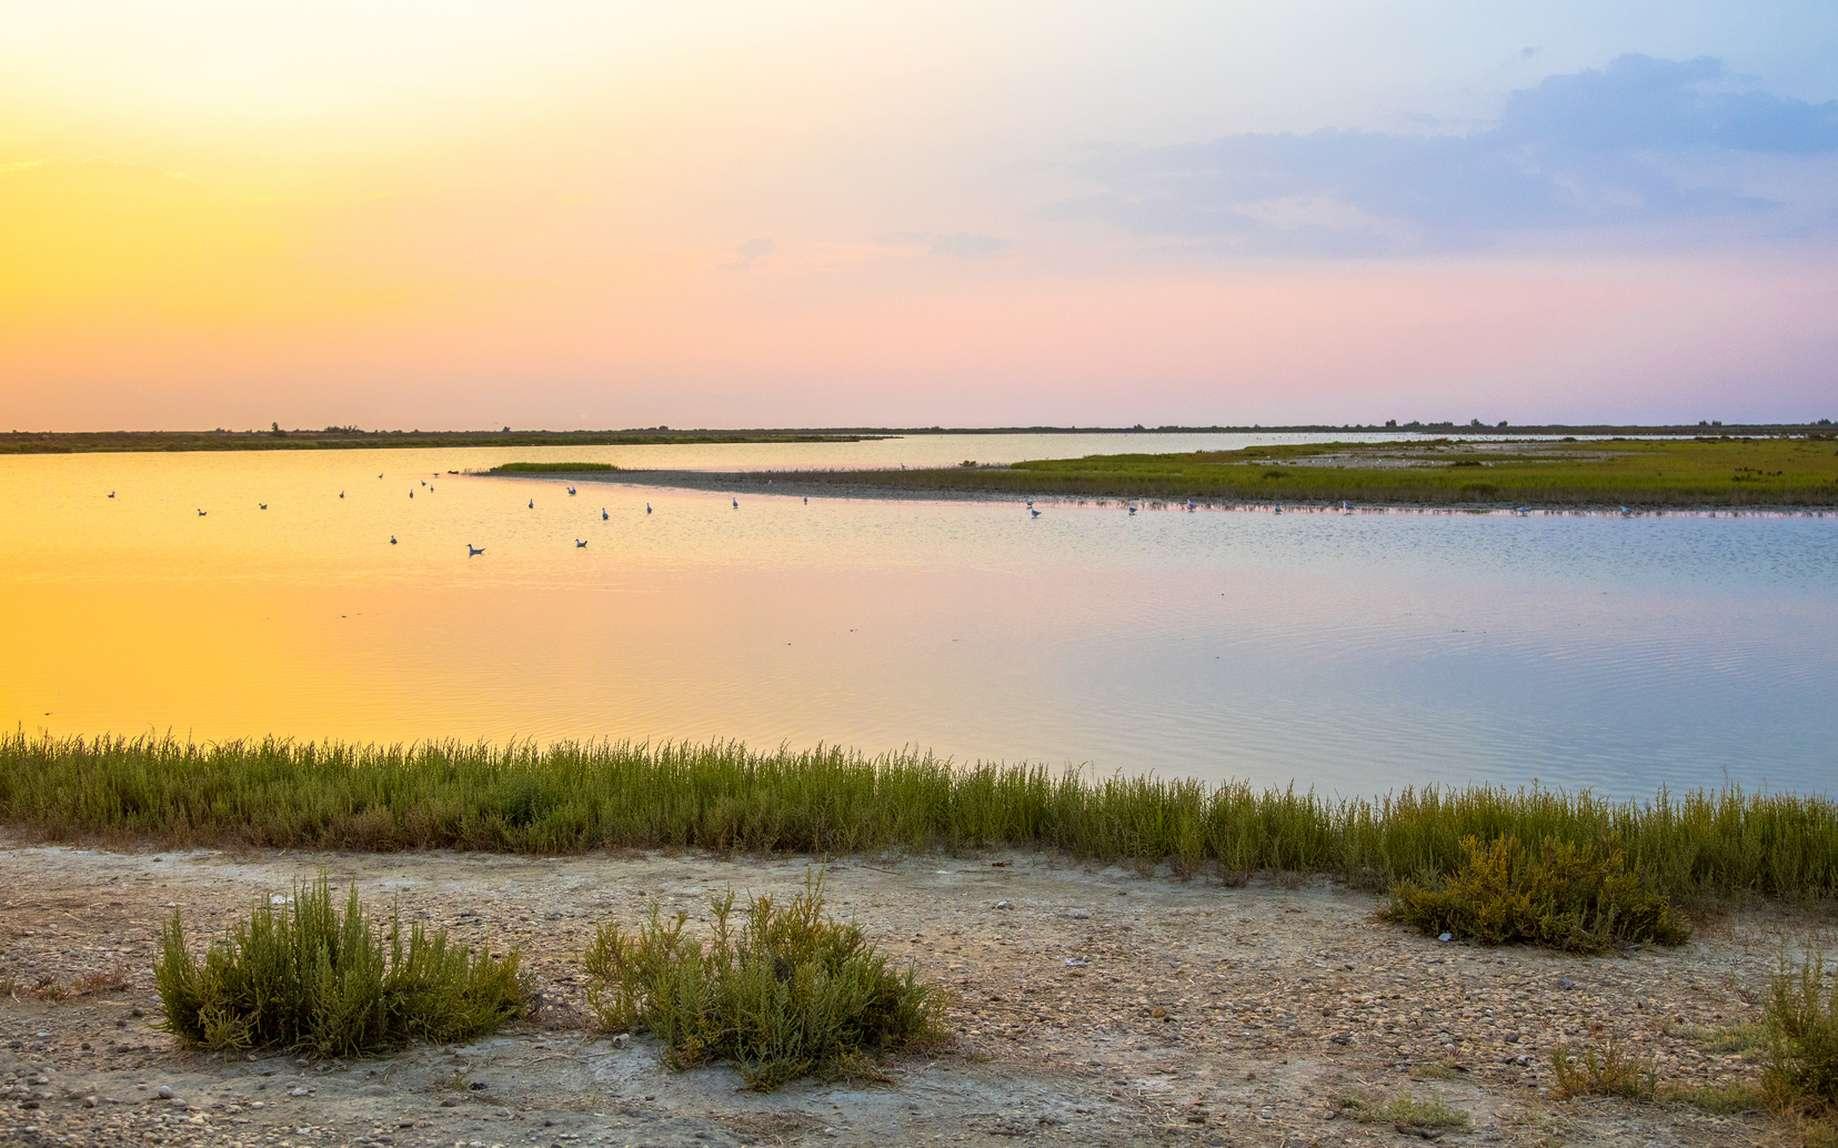 Tara va parcourir les deltas et fleuves européens. Ici, la Camargue. © creativenature.nl